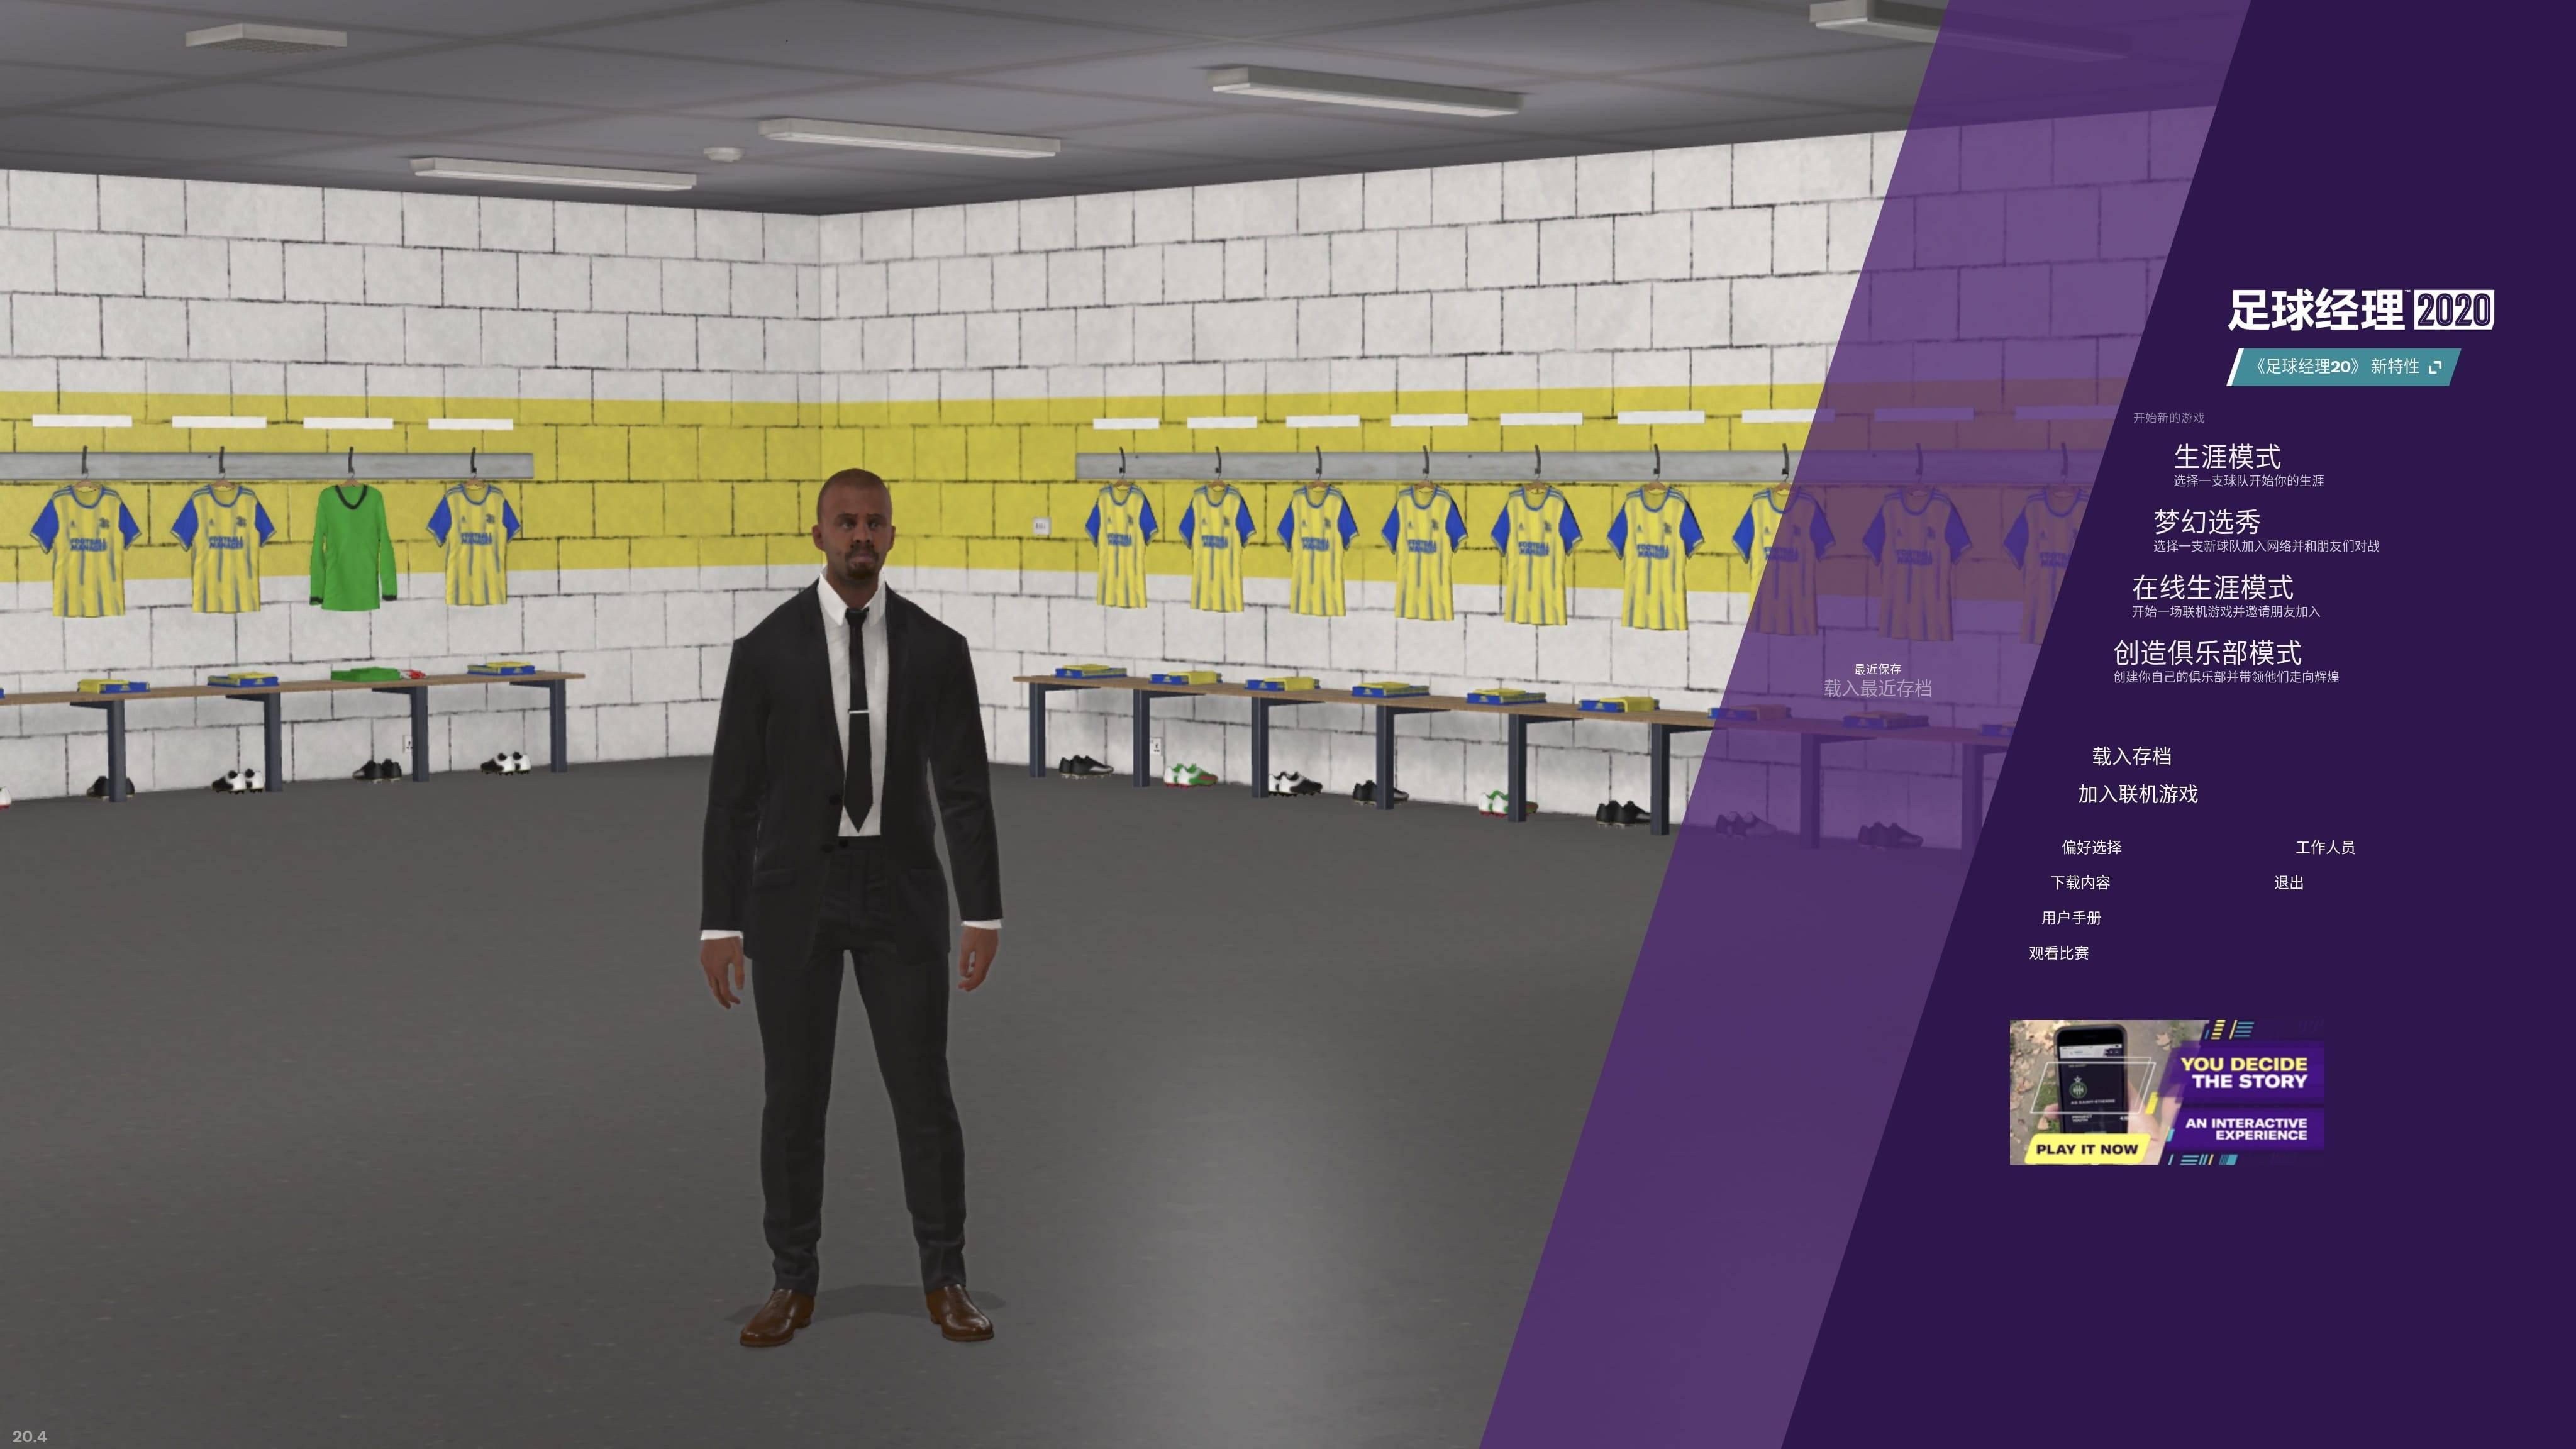 Football Manager 2020 for Mac 中文版足球经理2020 模拟经营游戏 第2张